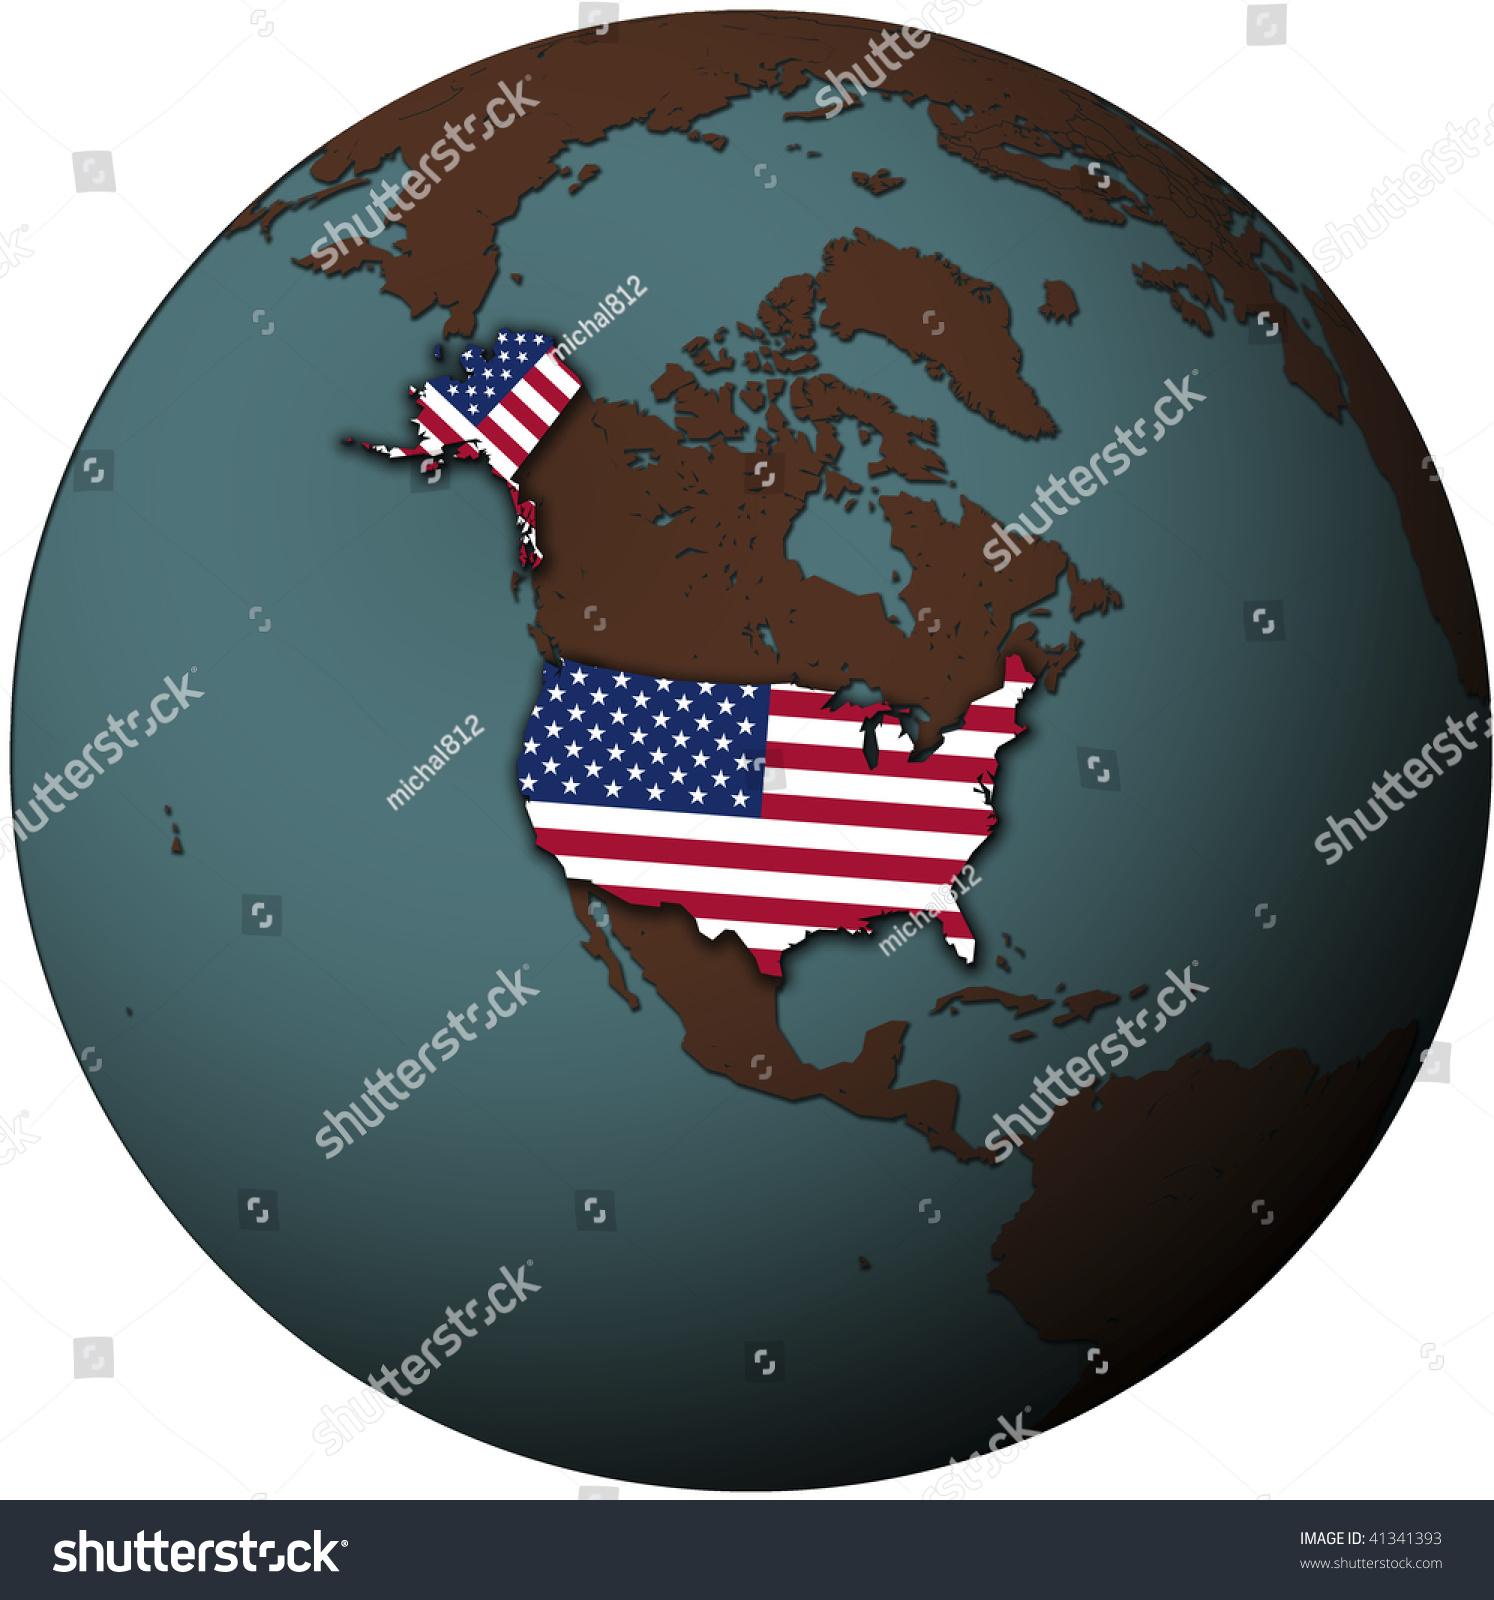 Usa Flag On Map Earth Globe Stock Illustration Shutterstock - Usa globe map